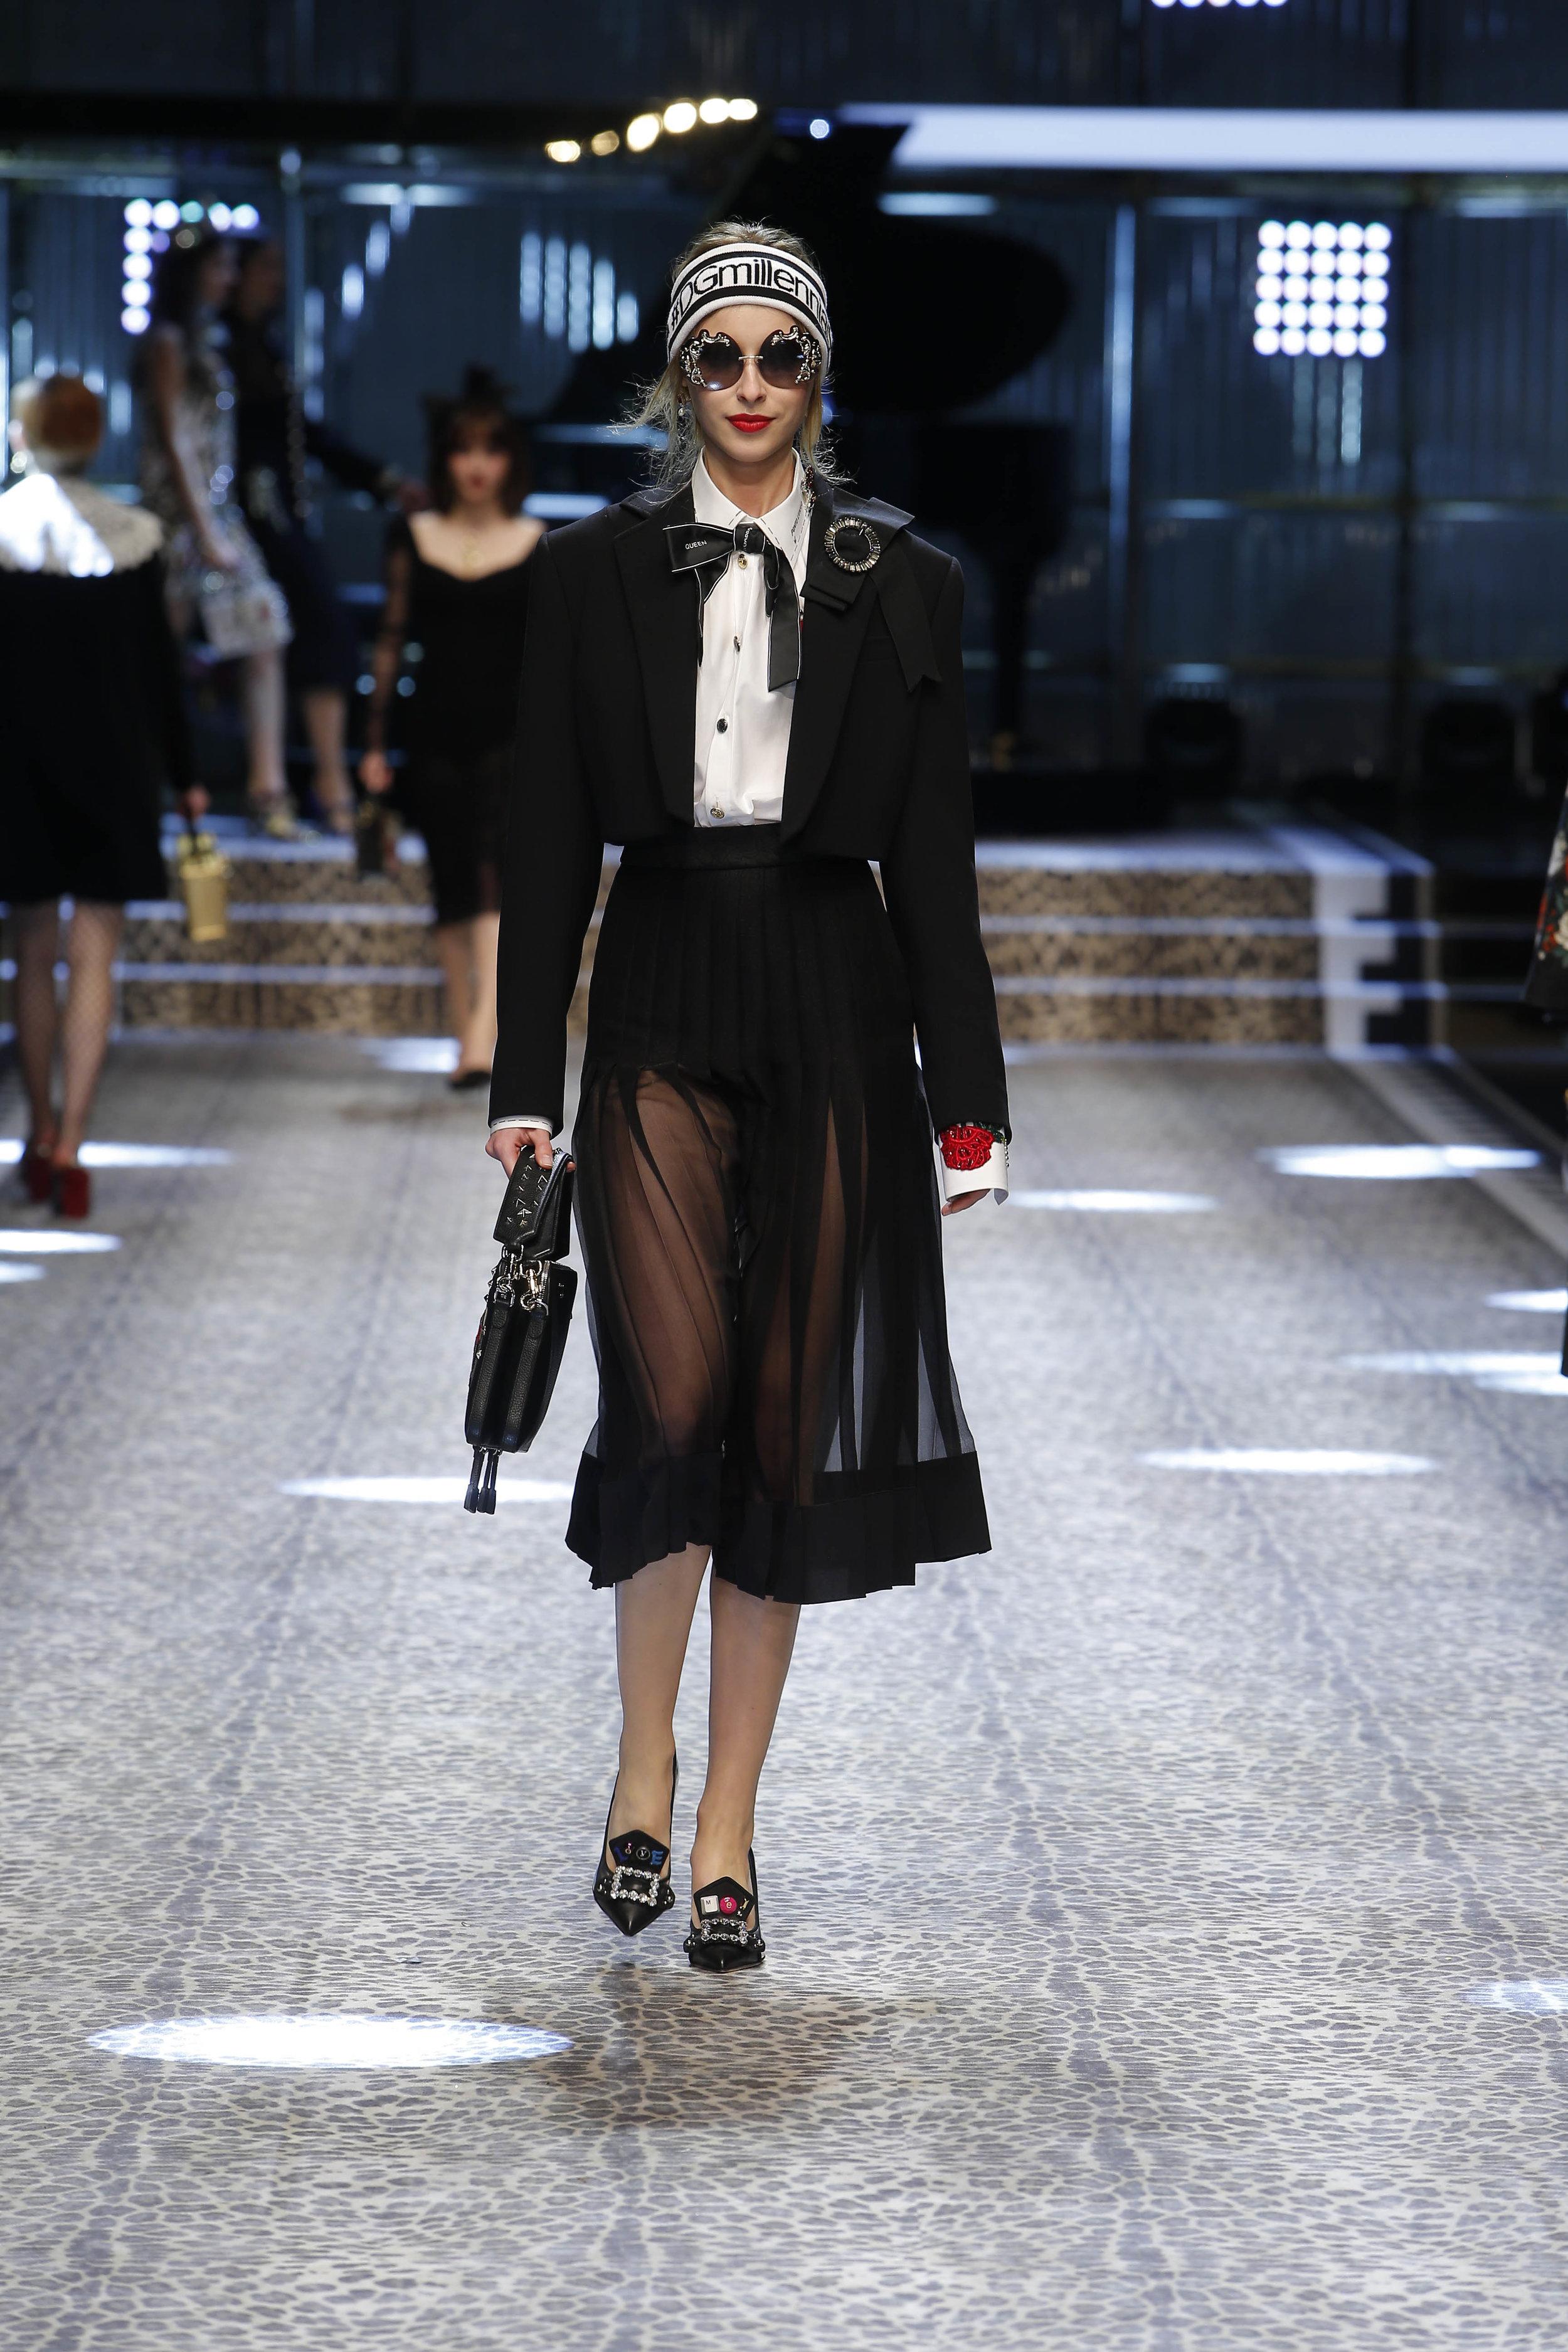 Dolce&Gabbana_women's fashion show fw17-18_Runway_images (28).jpg